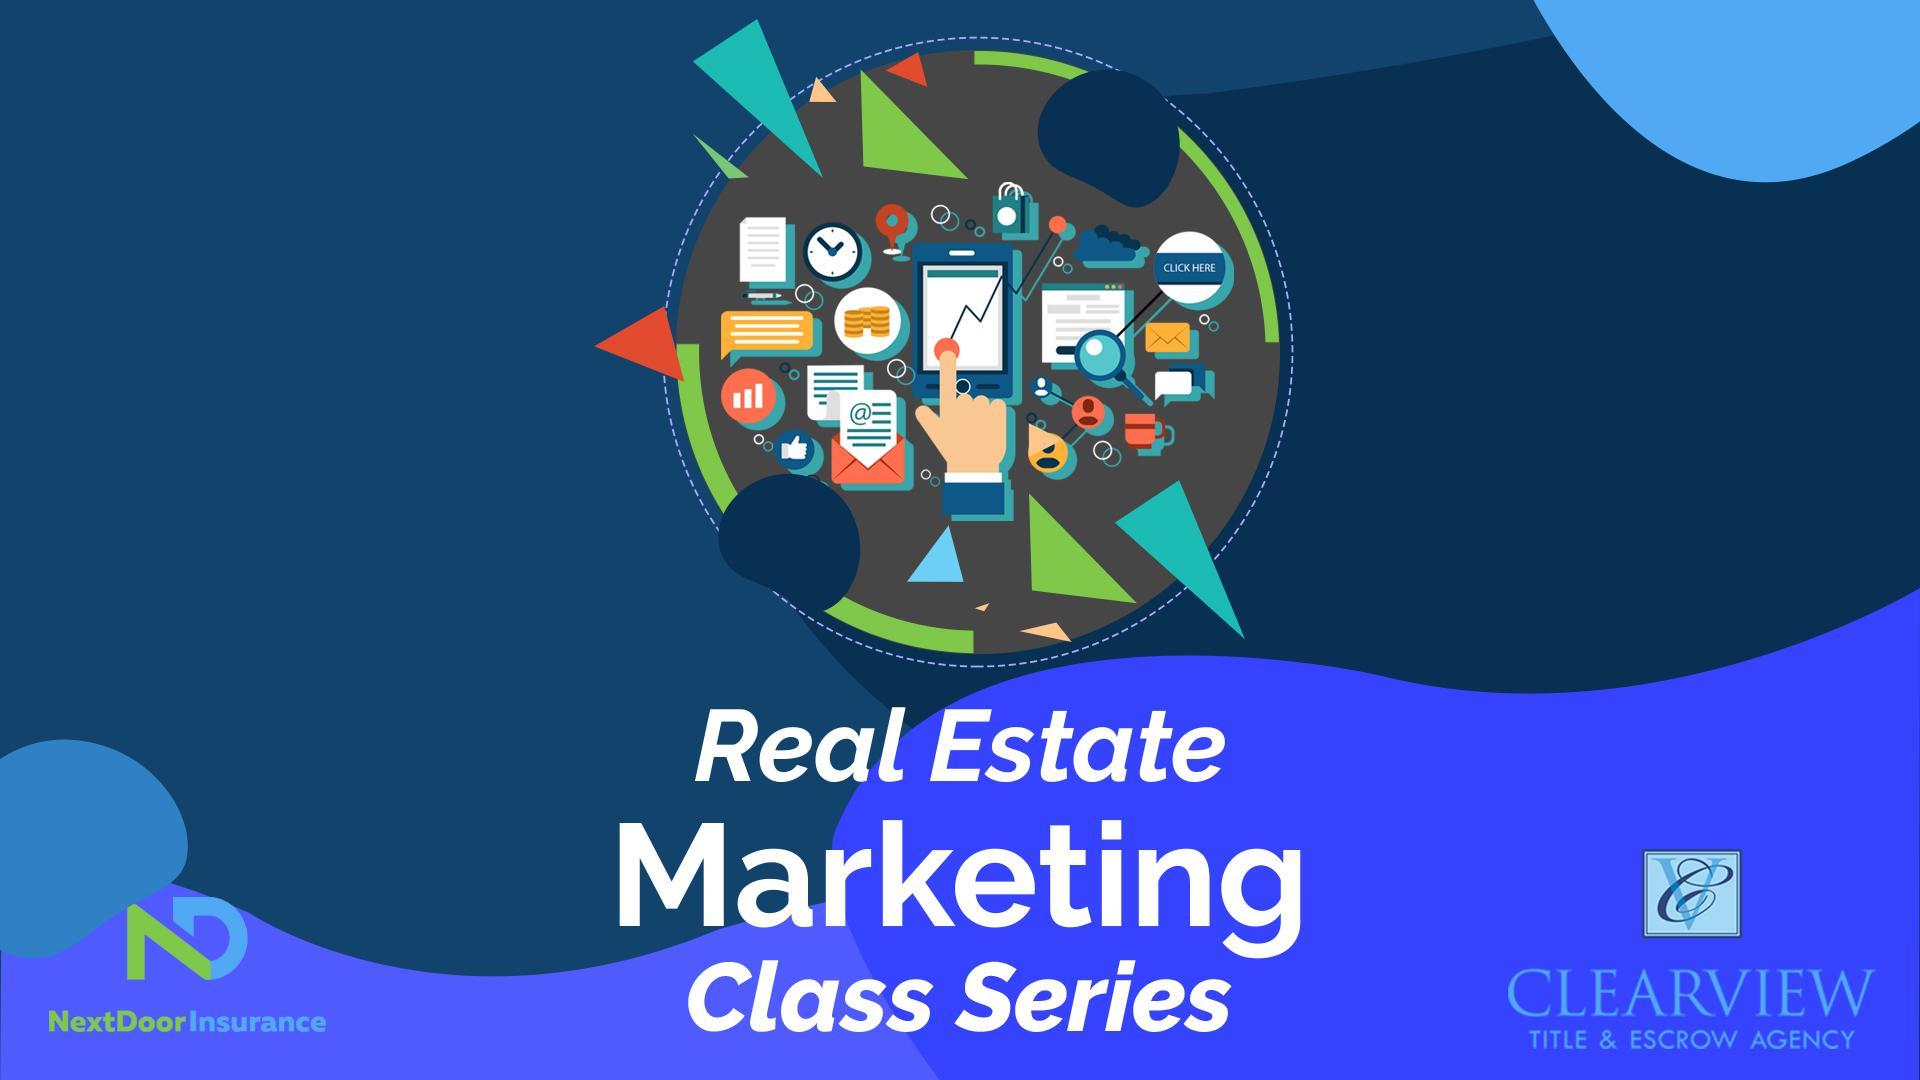 Real Estate Marketing Class Series